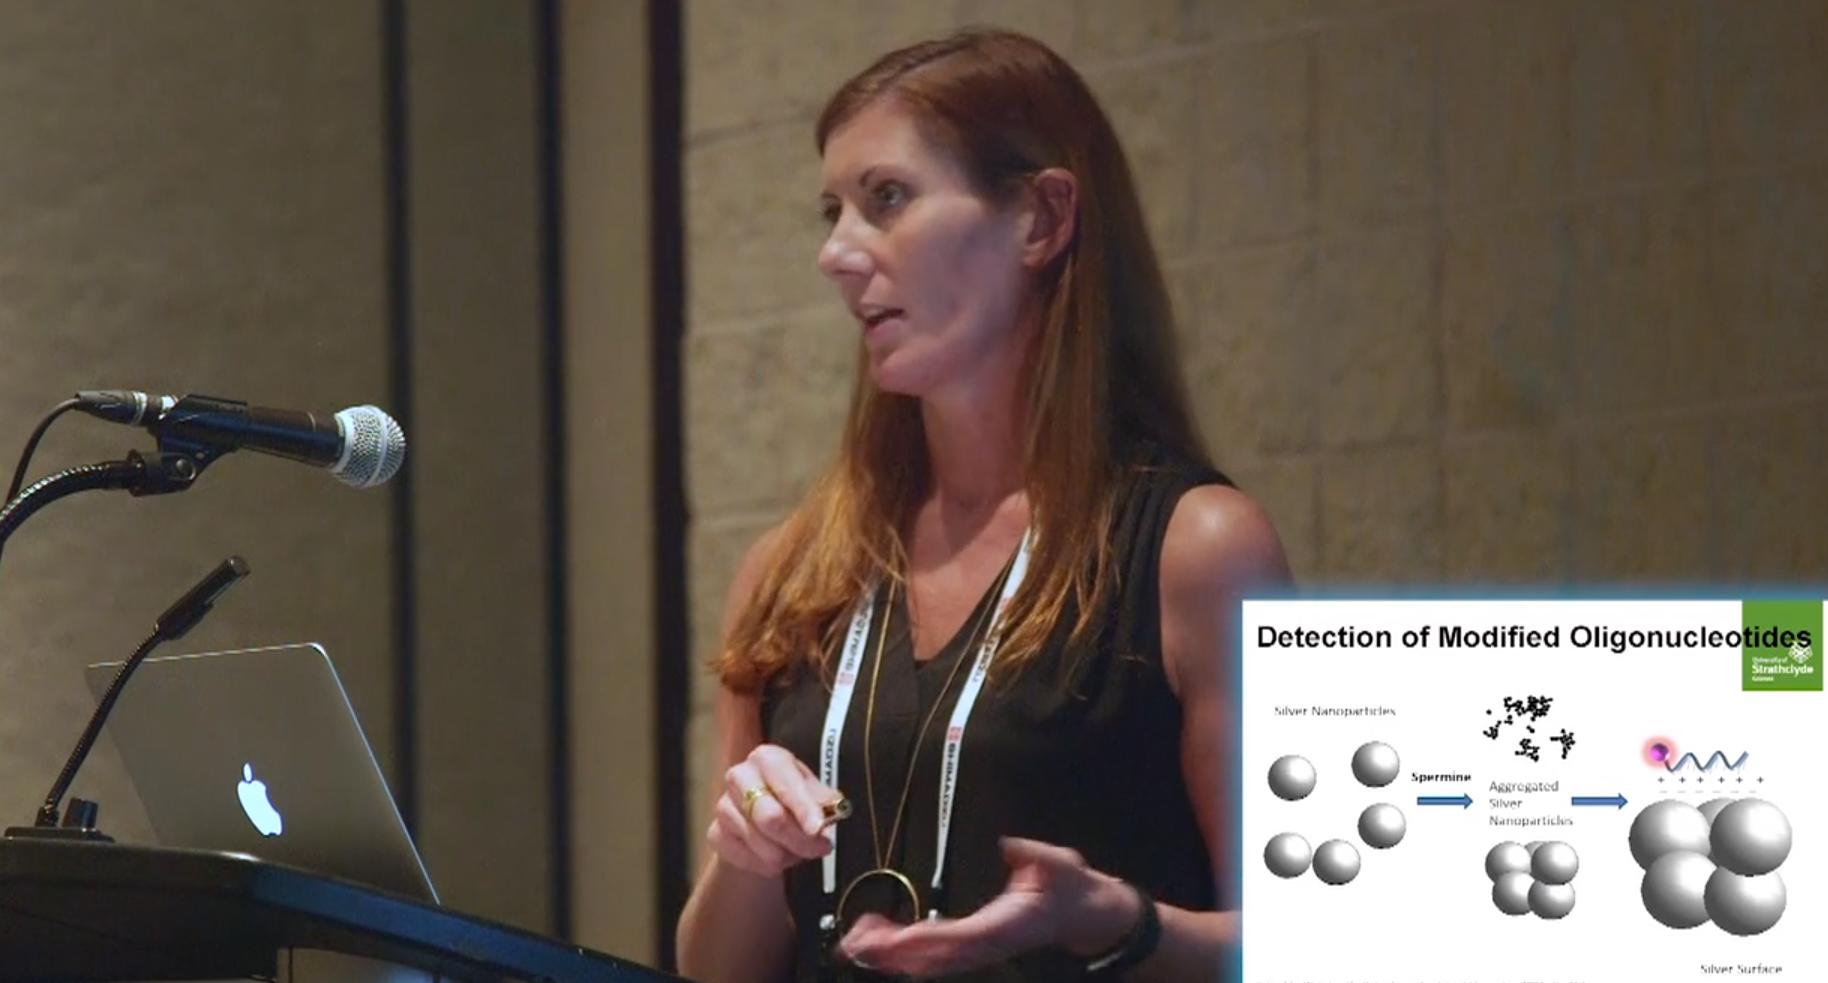 Multiplexed and Sensitive Bioanalysis Using SERS